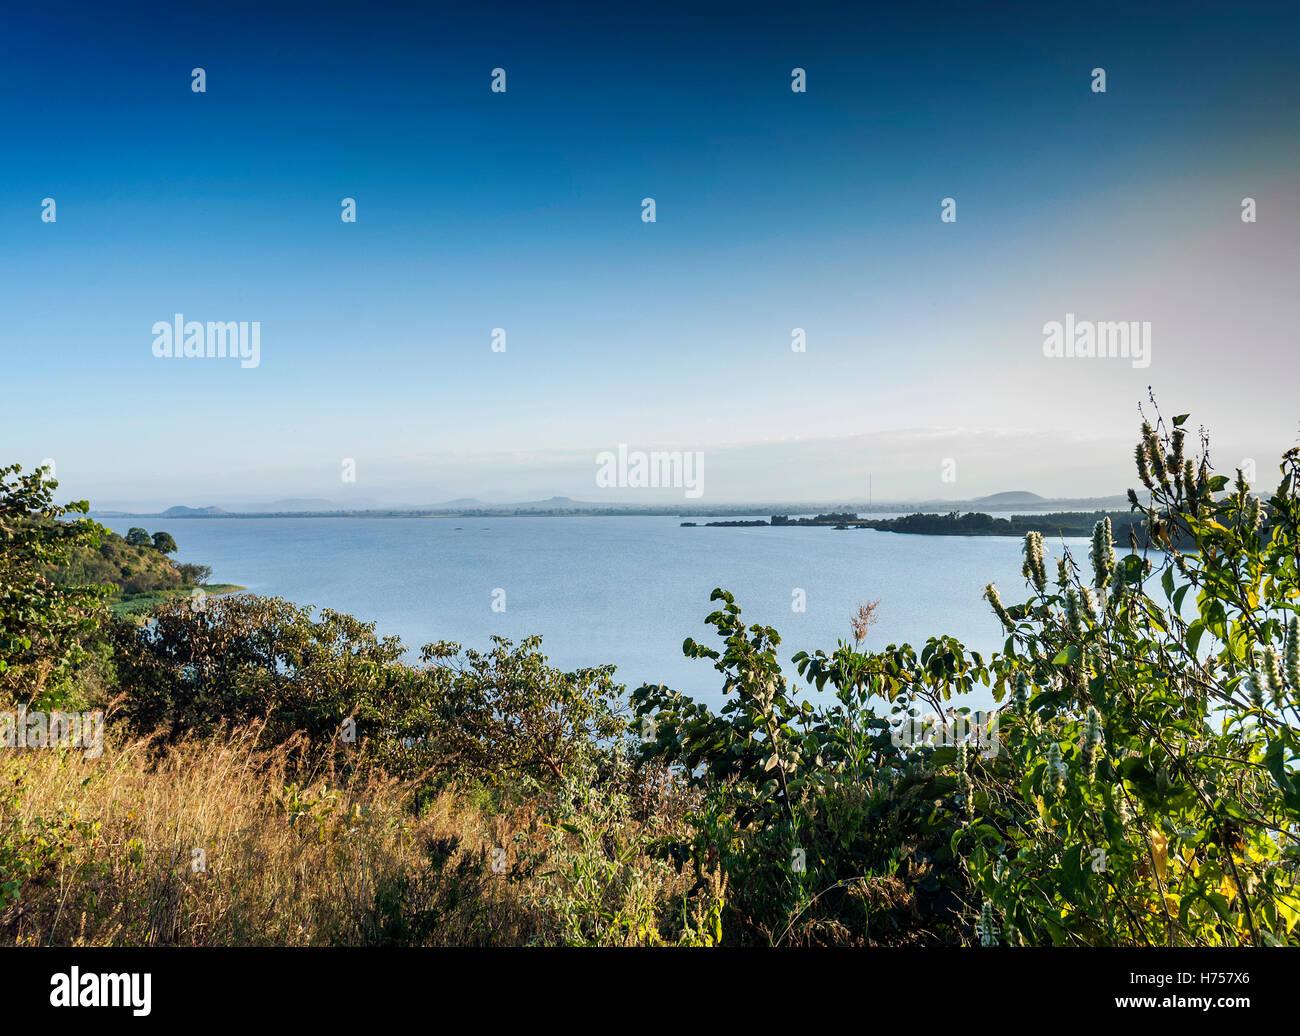 view of famous lake tana near bahir dar ethiopia - Stock Image